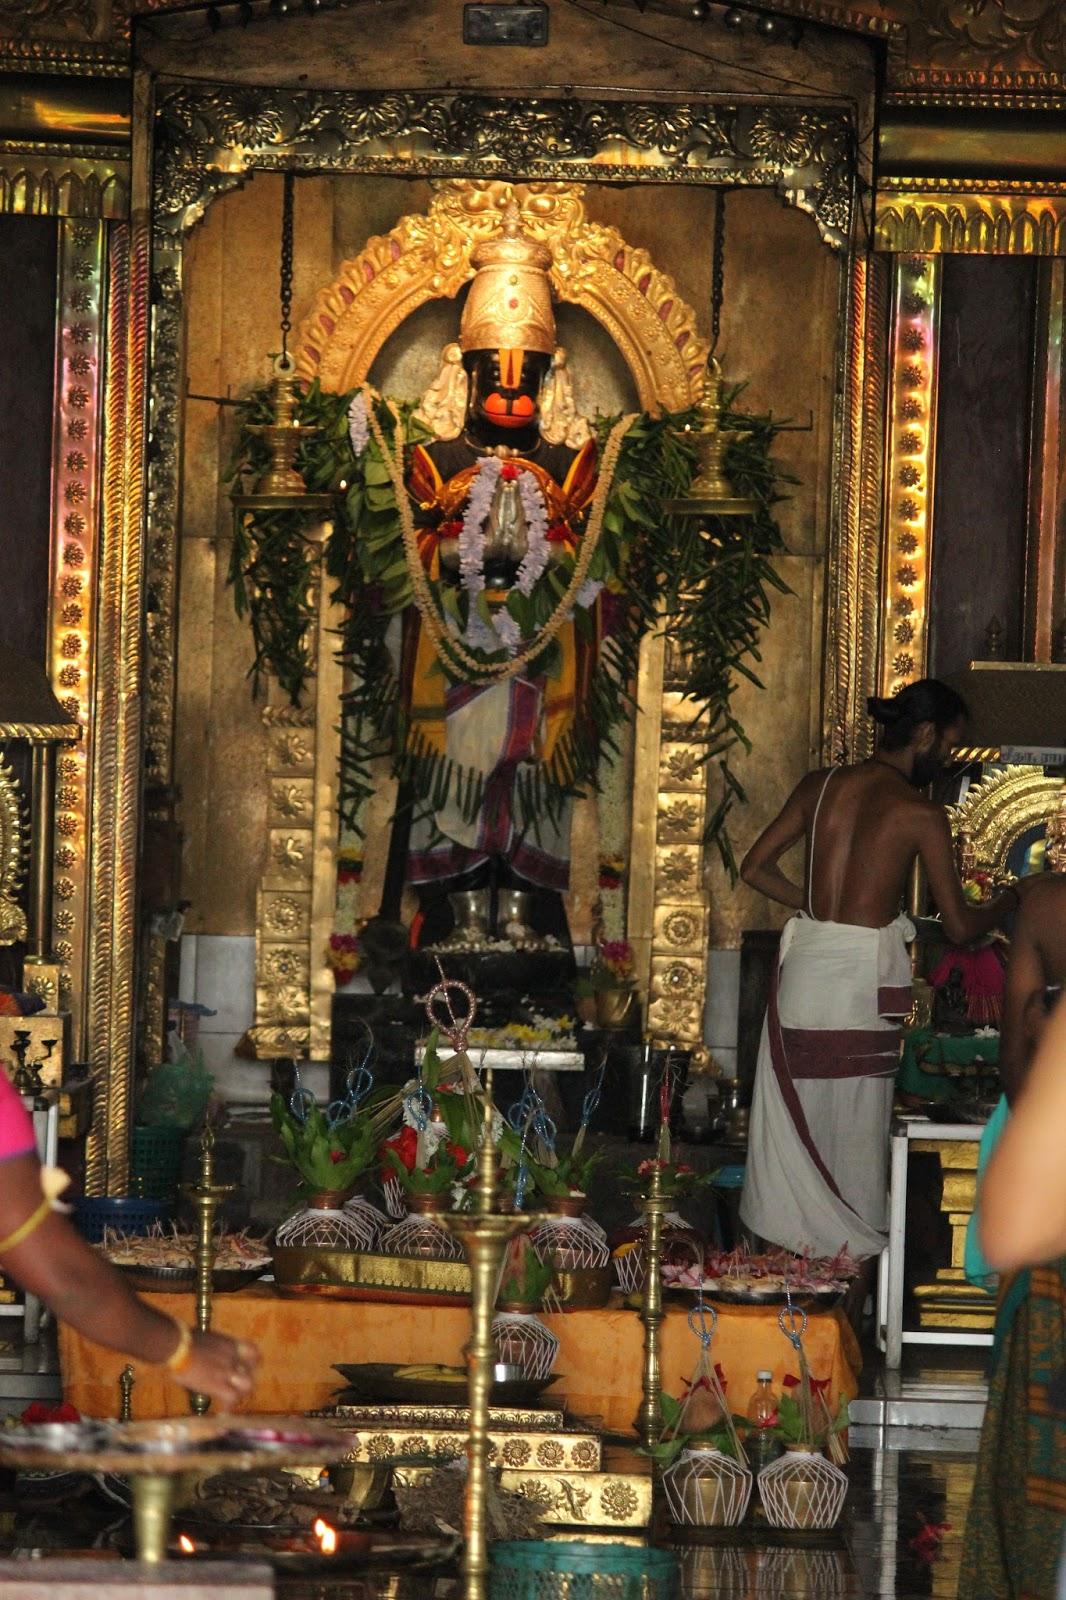 Methinks : Hanuman built on a dream